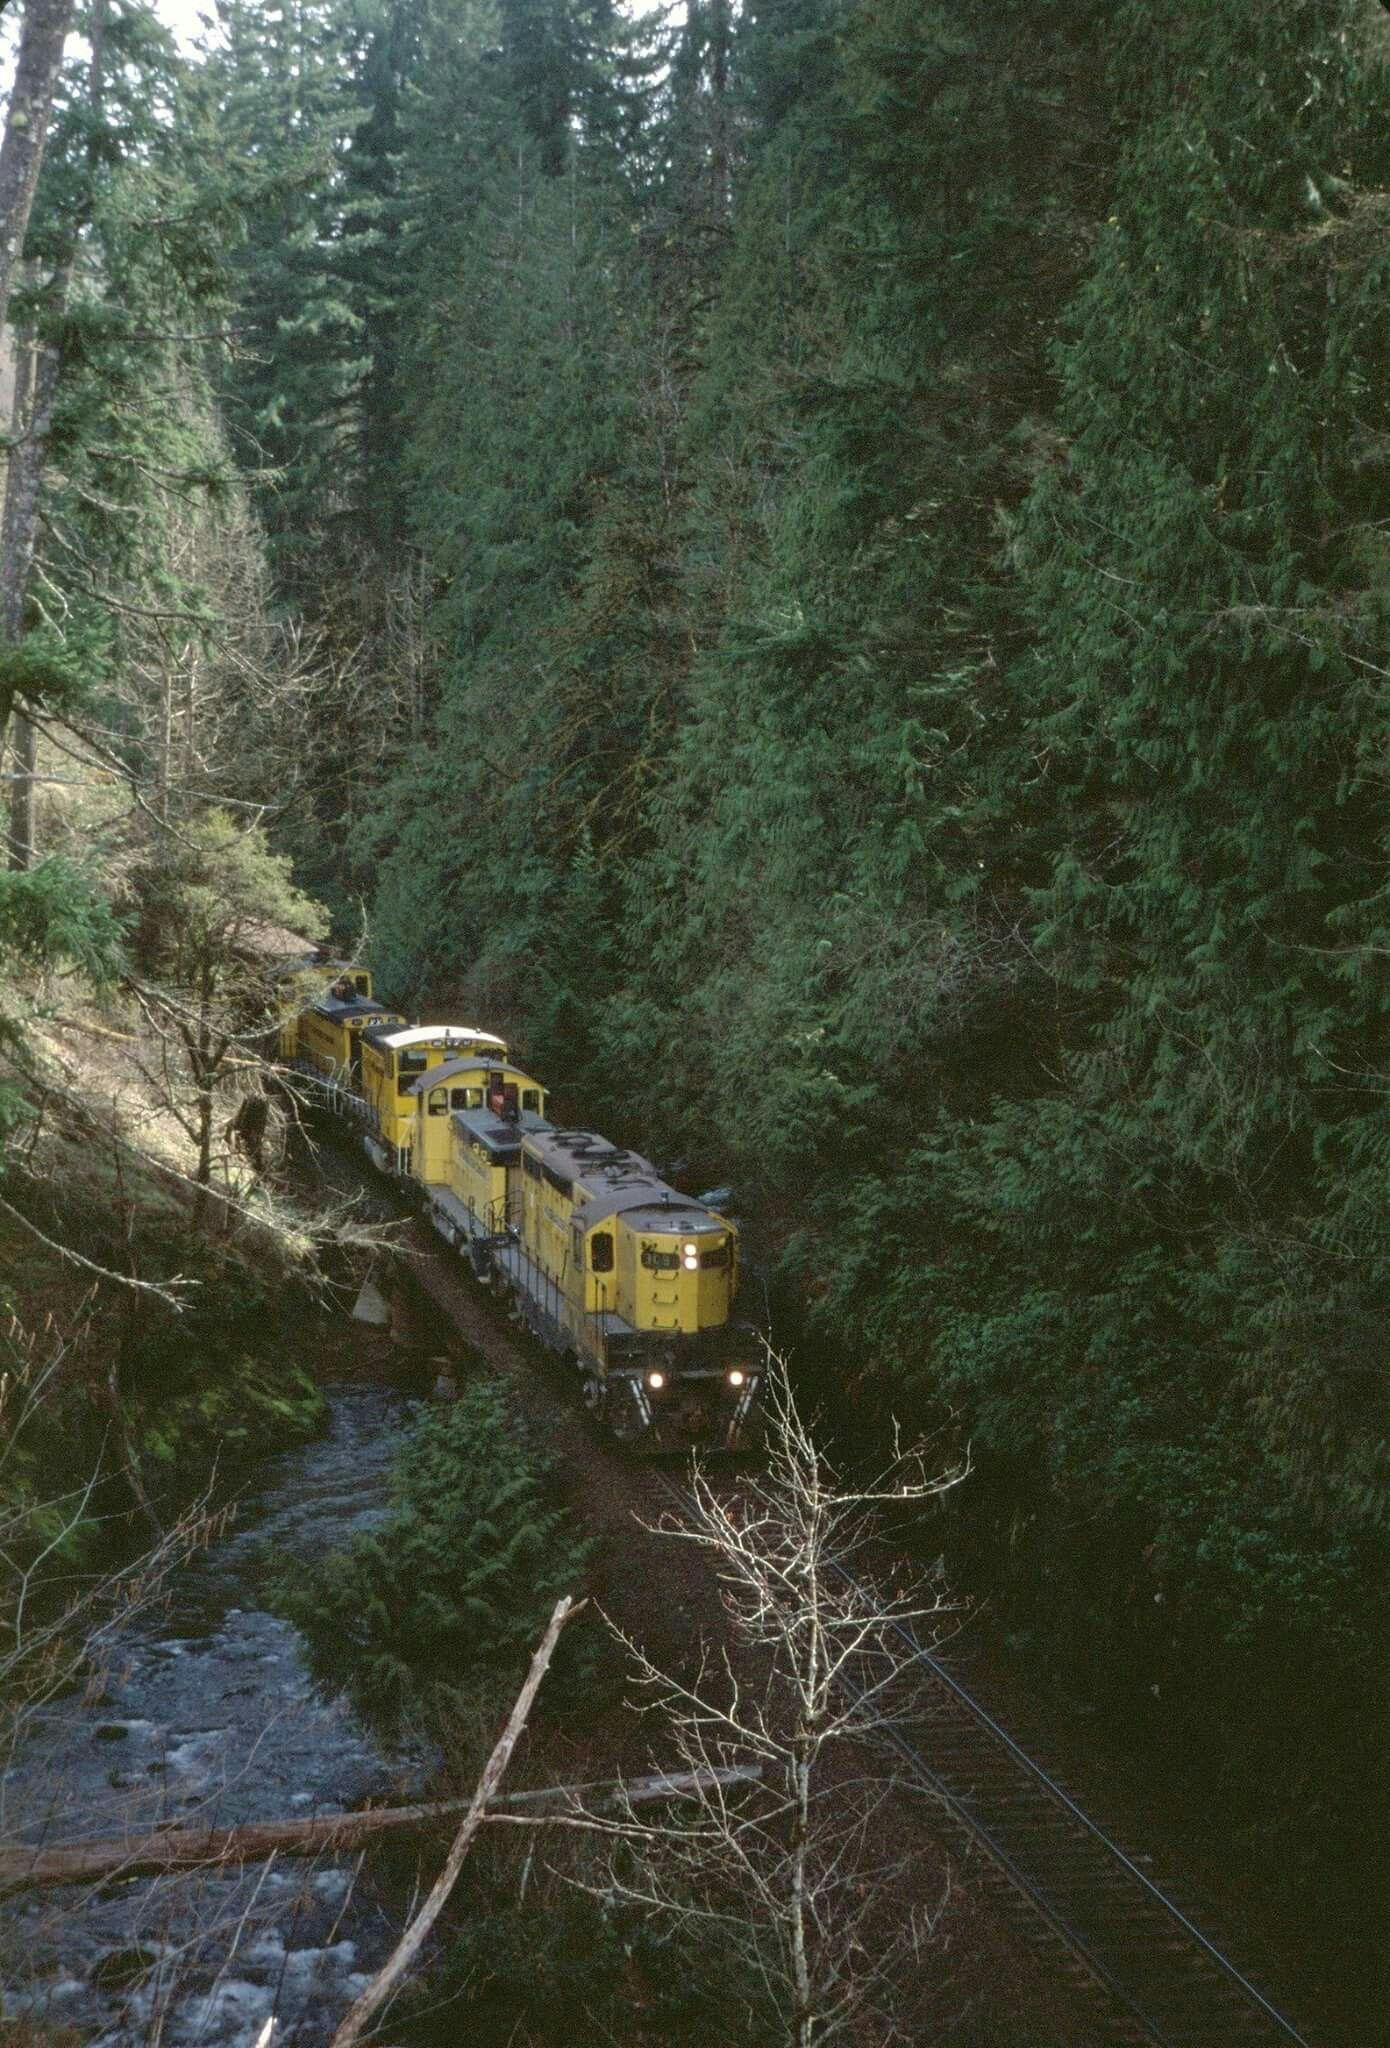 Taken during better times Weyerhaeuser's Woods train from